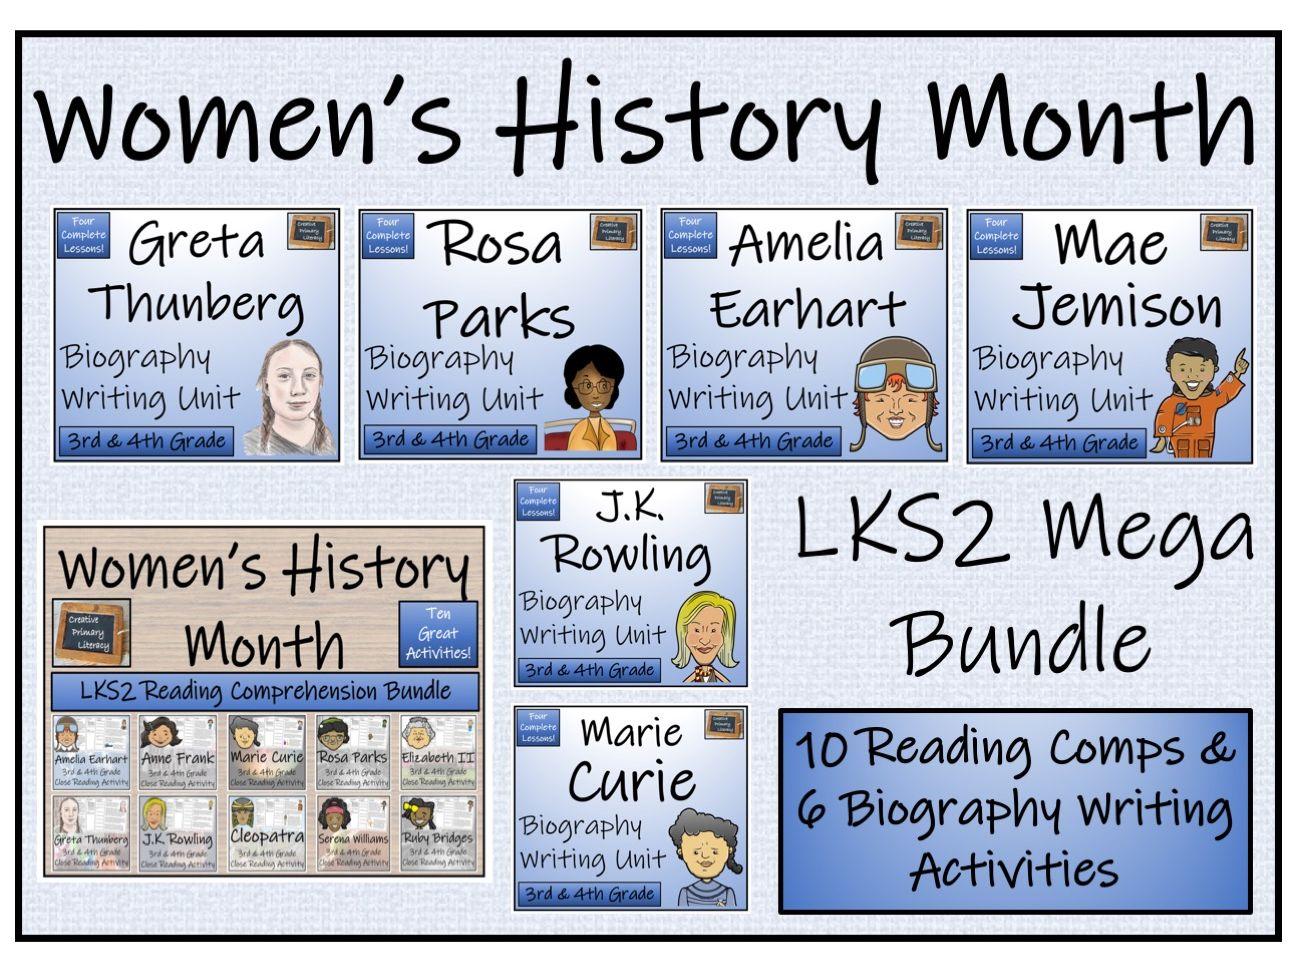 LKS2 Women's History Month Reading Comprehension & Biography Writing Mega Bundle